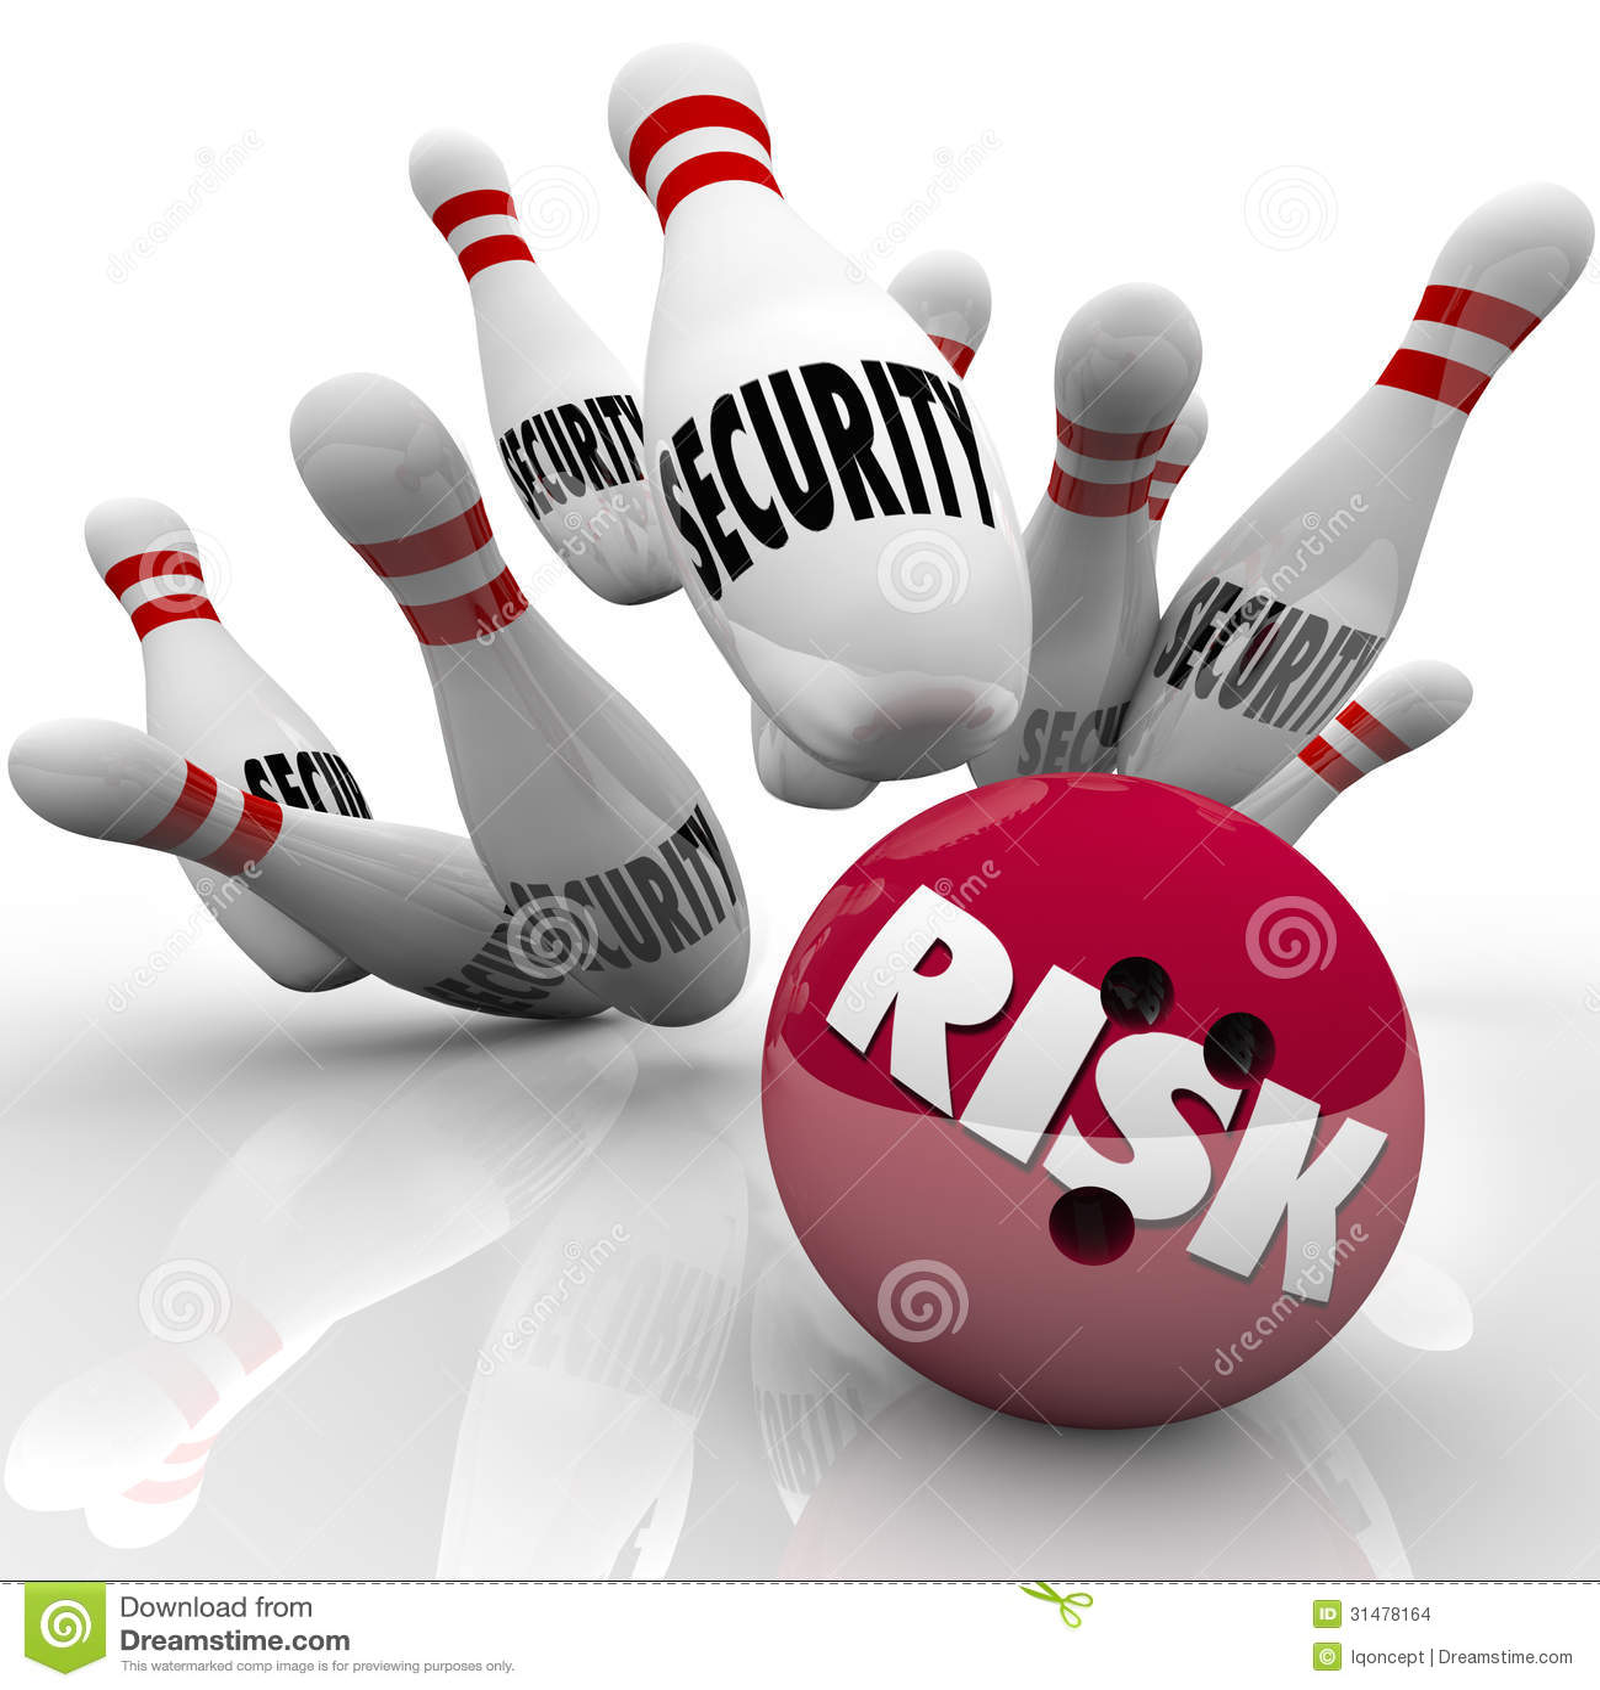 ... Risk Bowling Ball Danger Risking Safety Stock Images - Image: 31478164